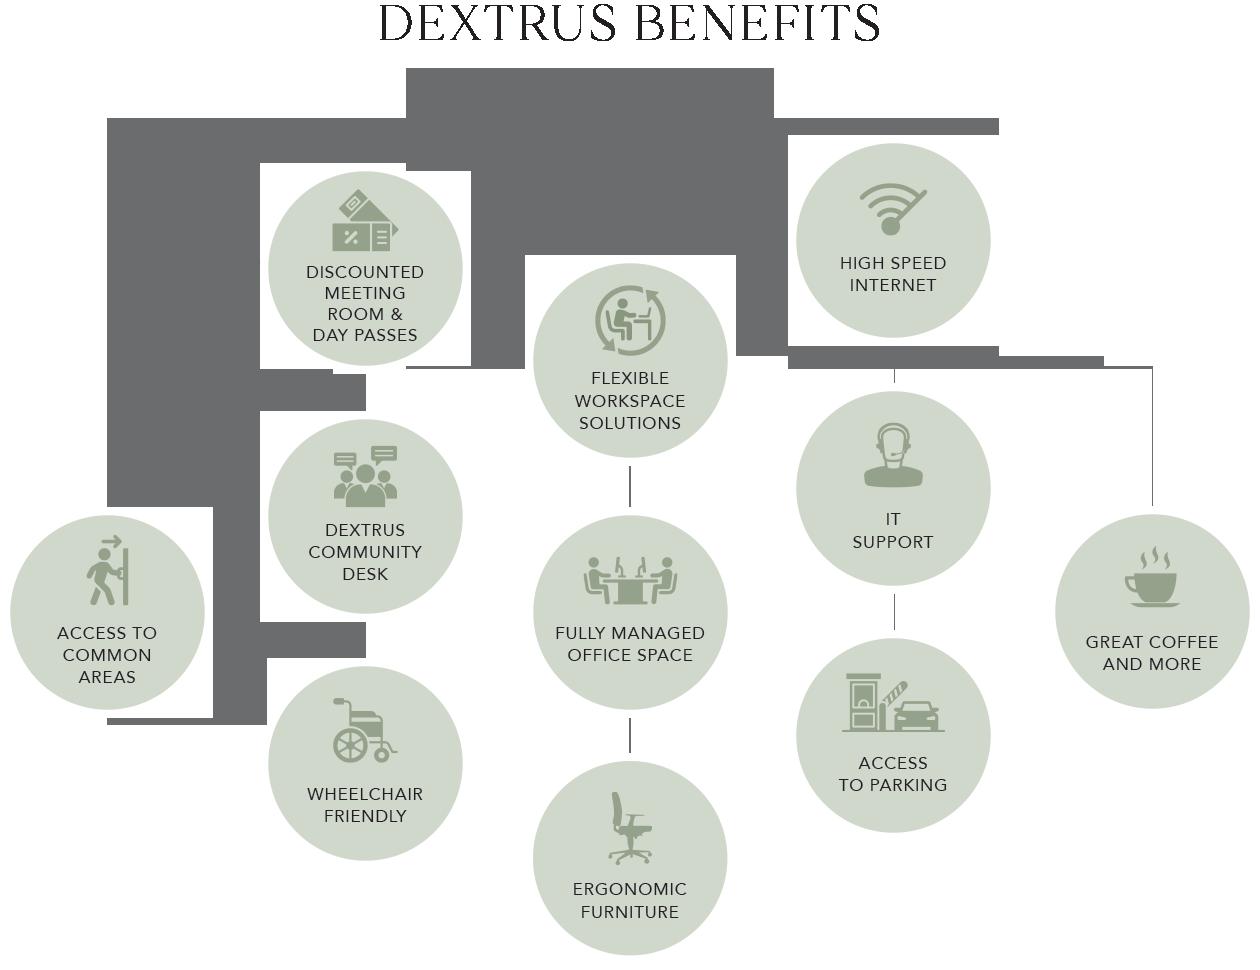 Dextrus Benefits - Membership Plans